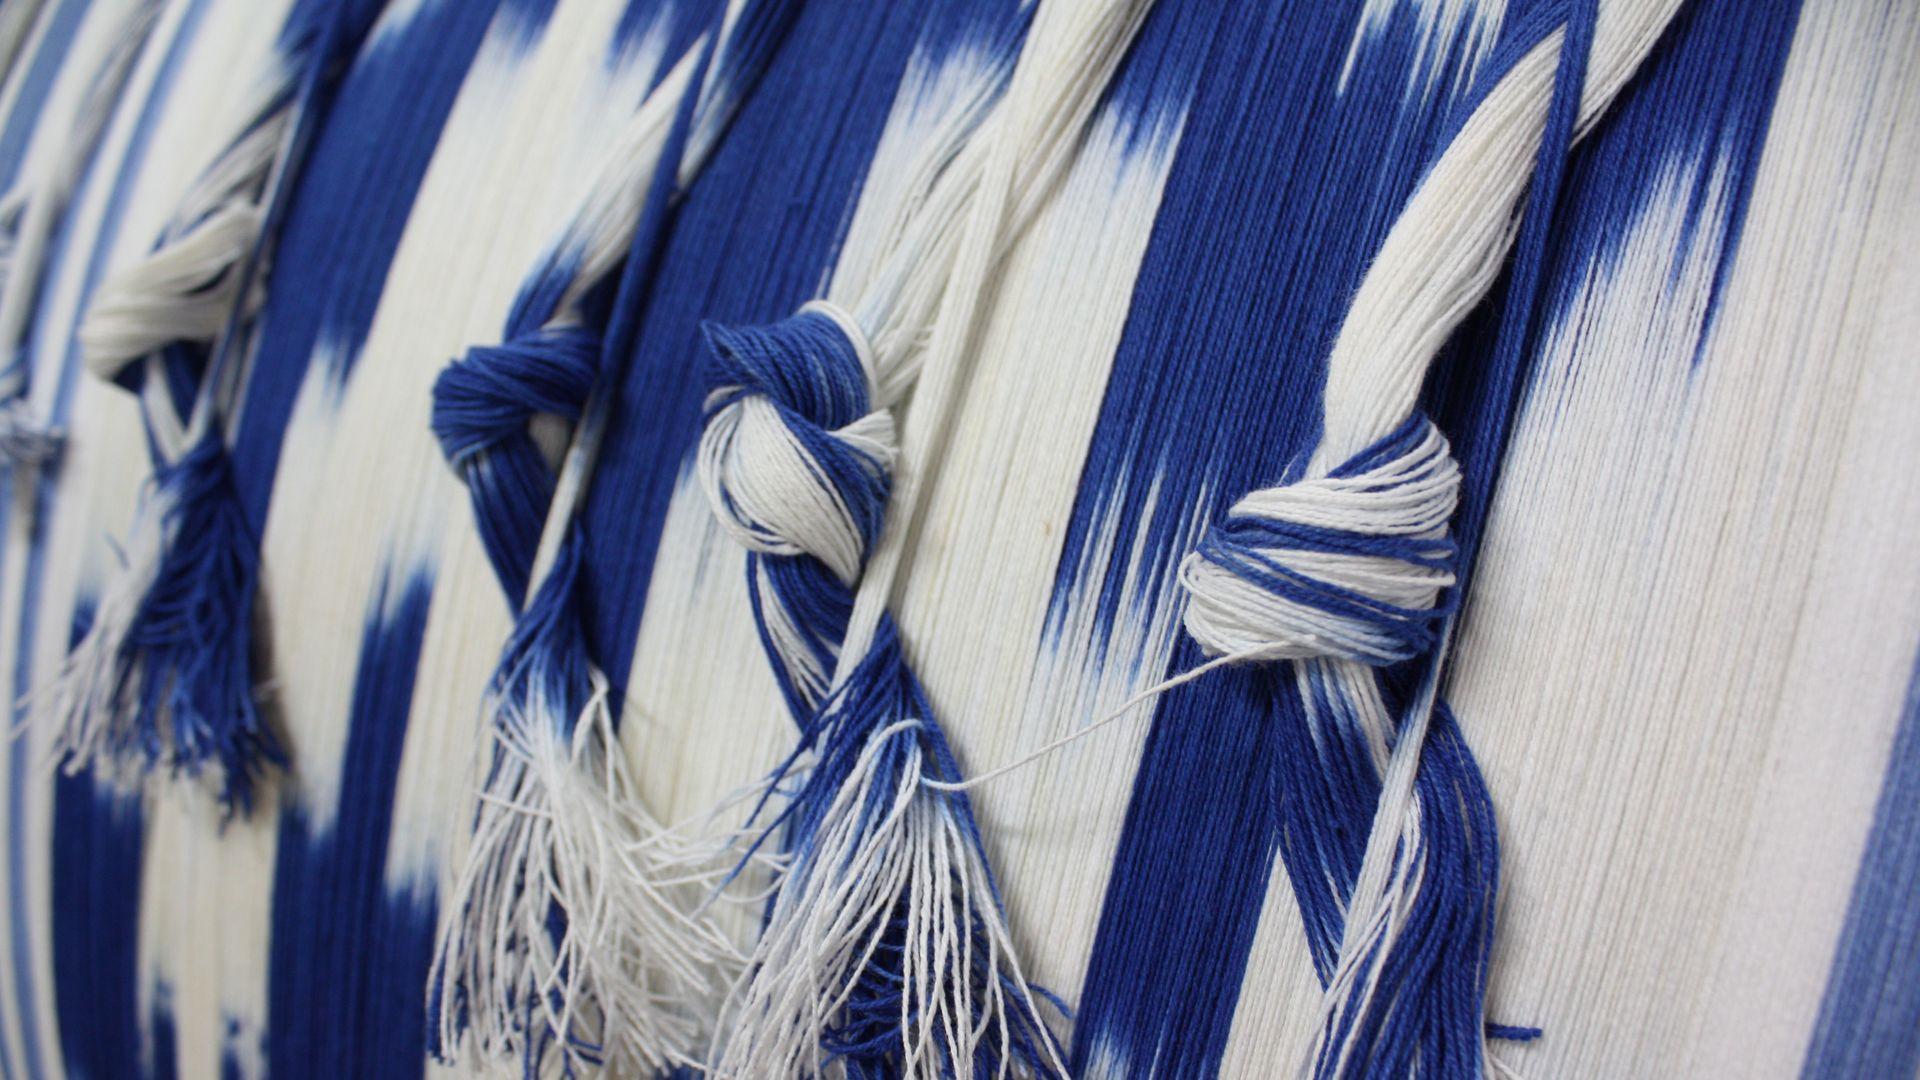 Imagen  Roba de llengües (tounge fabrics) from Mallorca